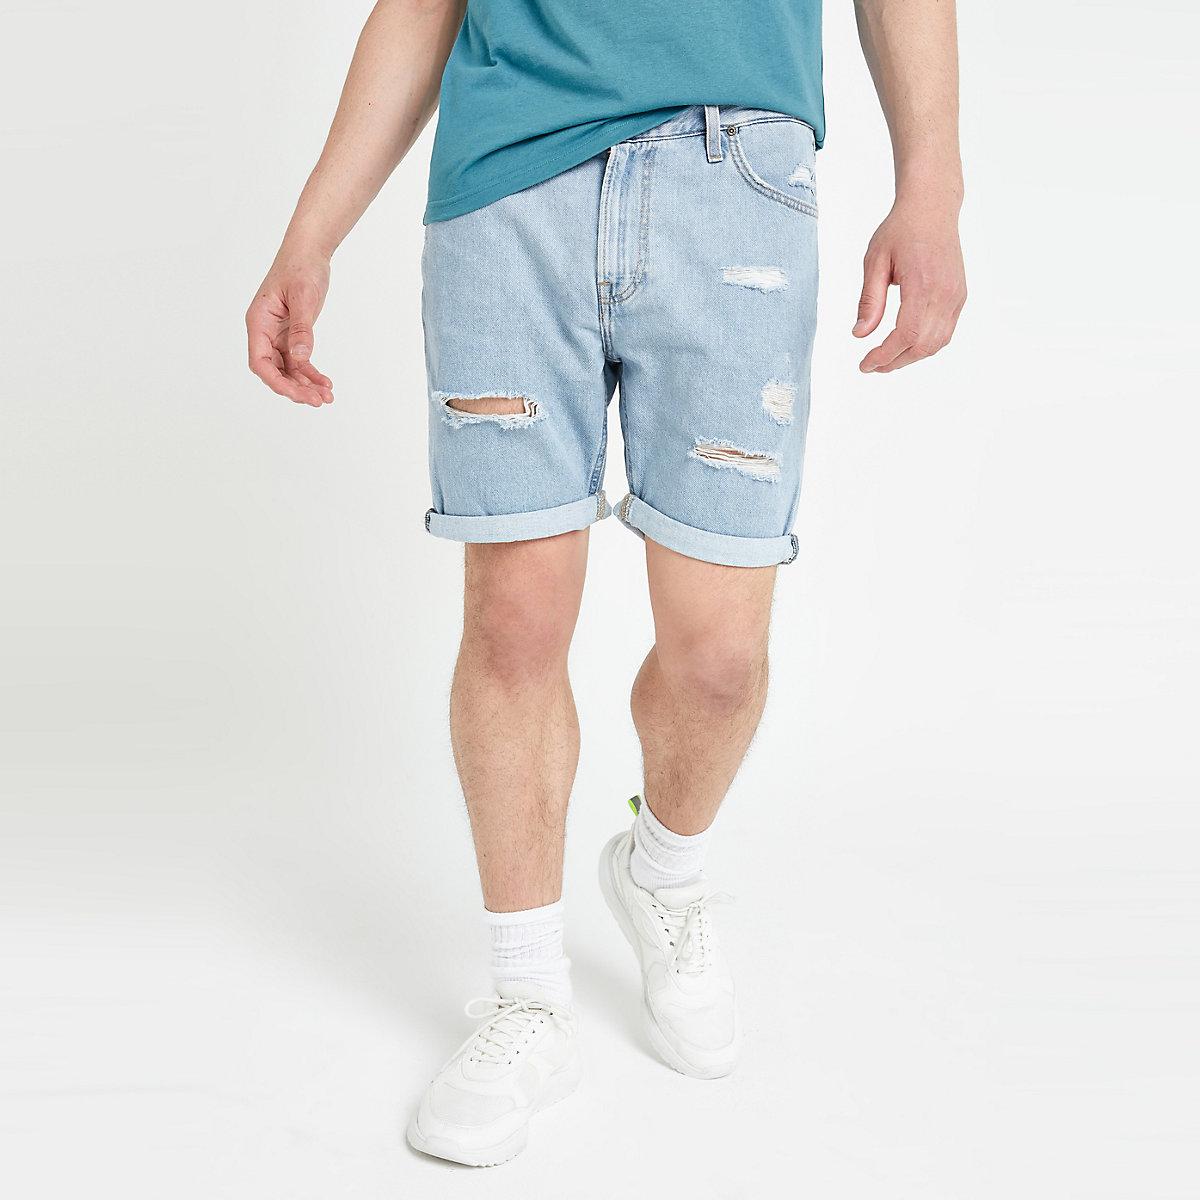 Lee blue ripped denim shorts